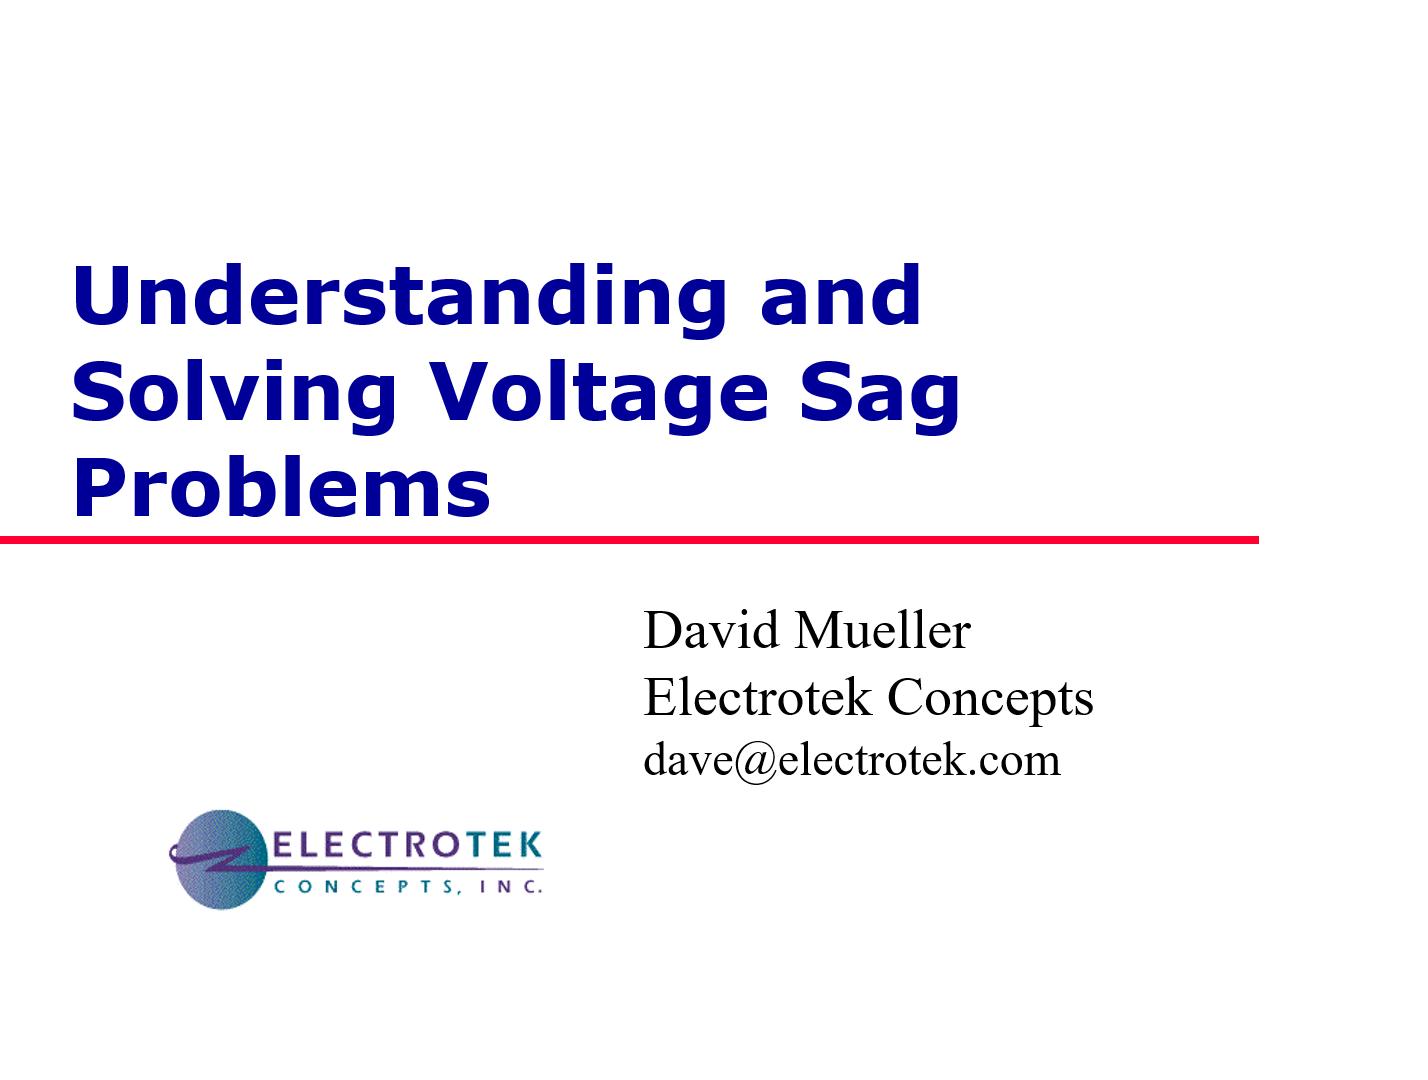 Understanding and Solving Voltage Sag Problems_1